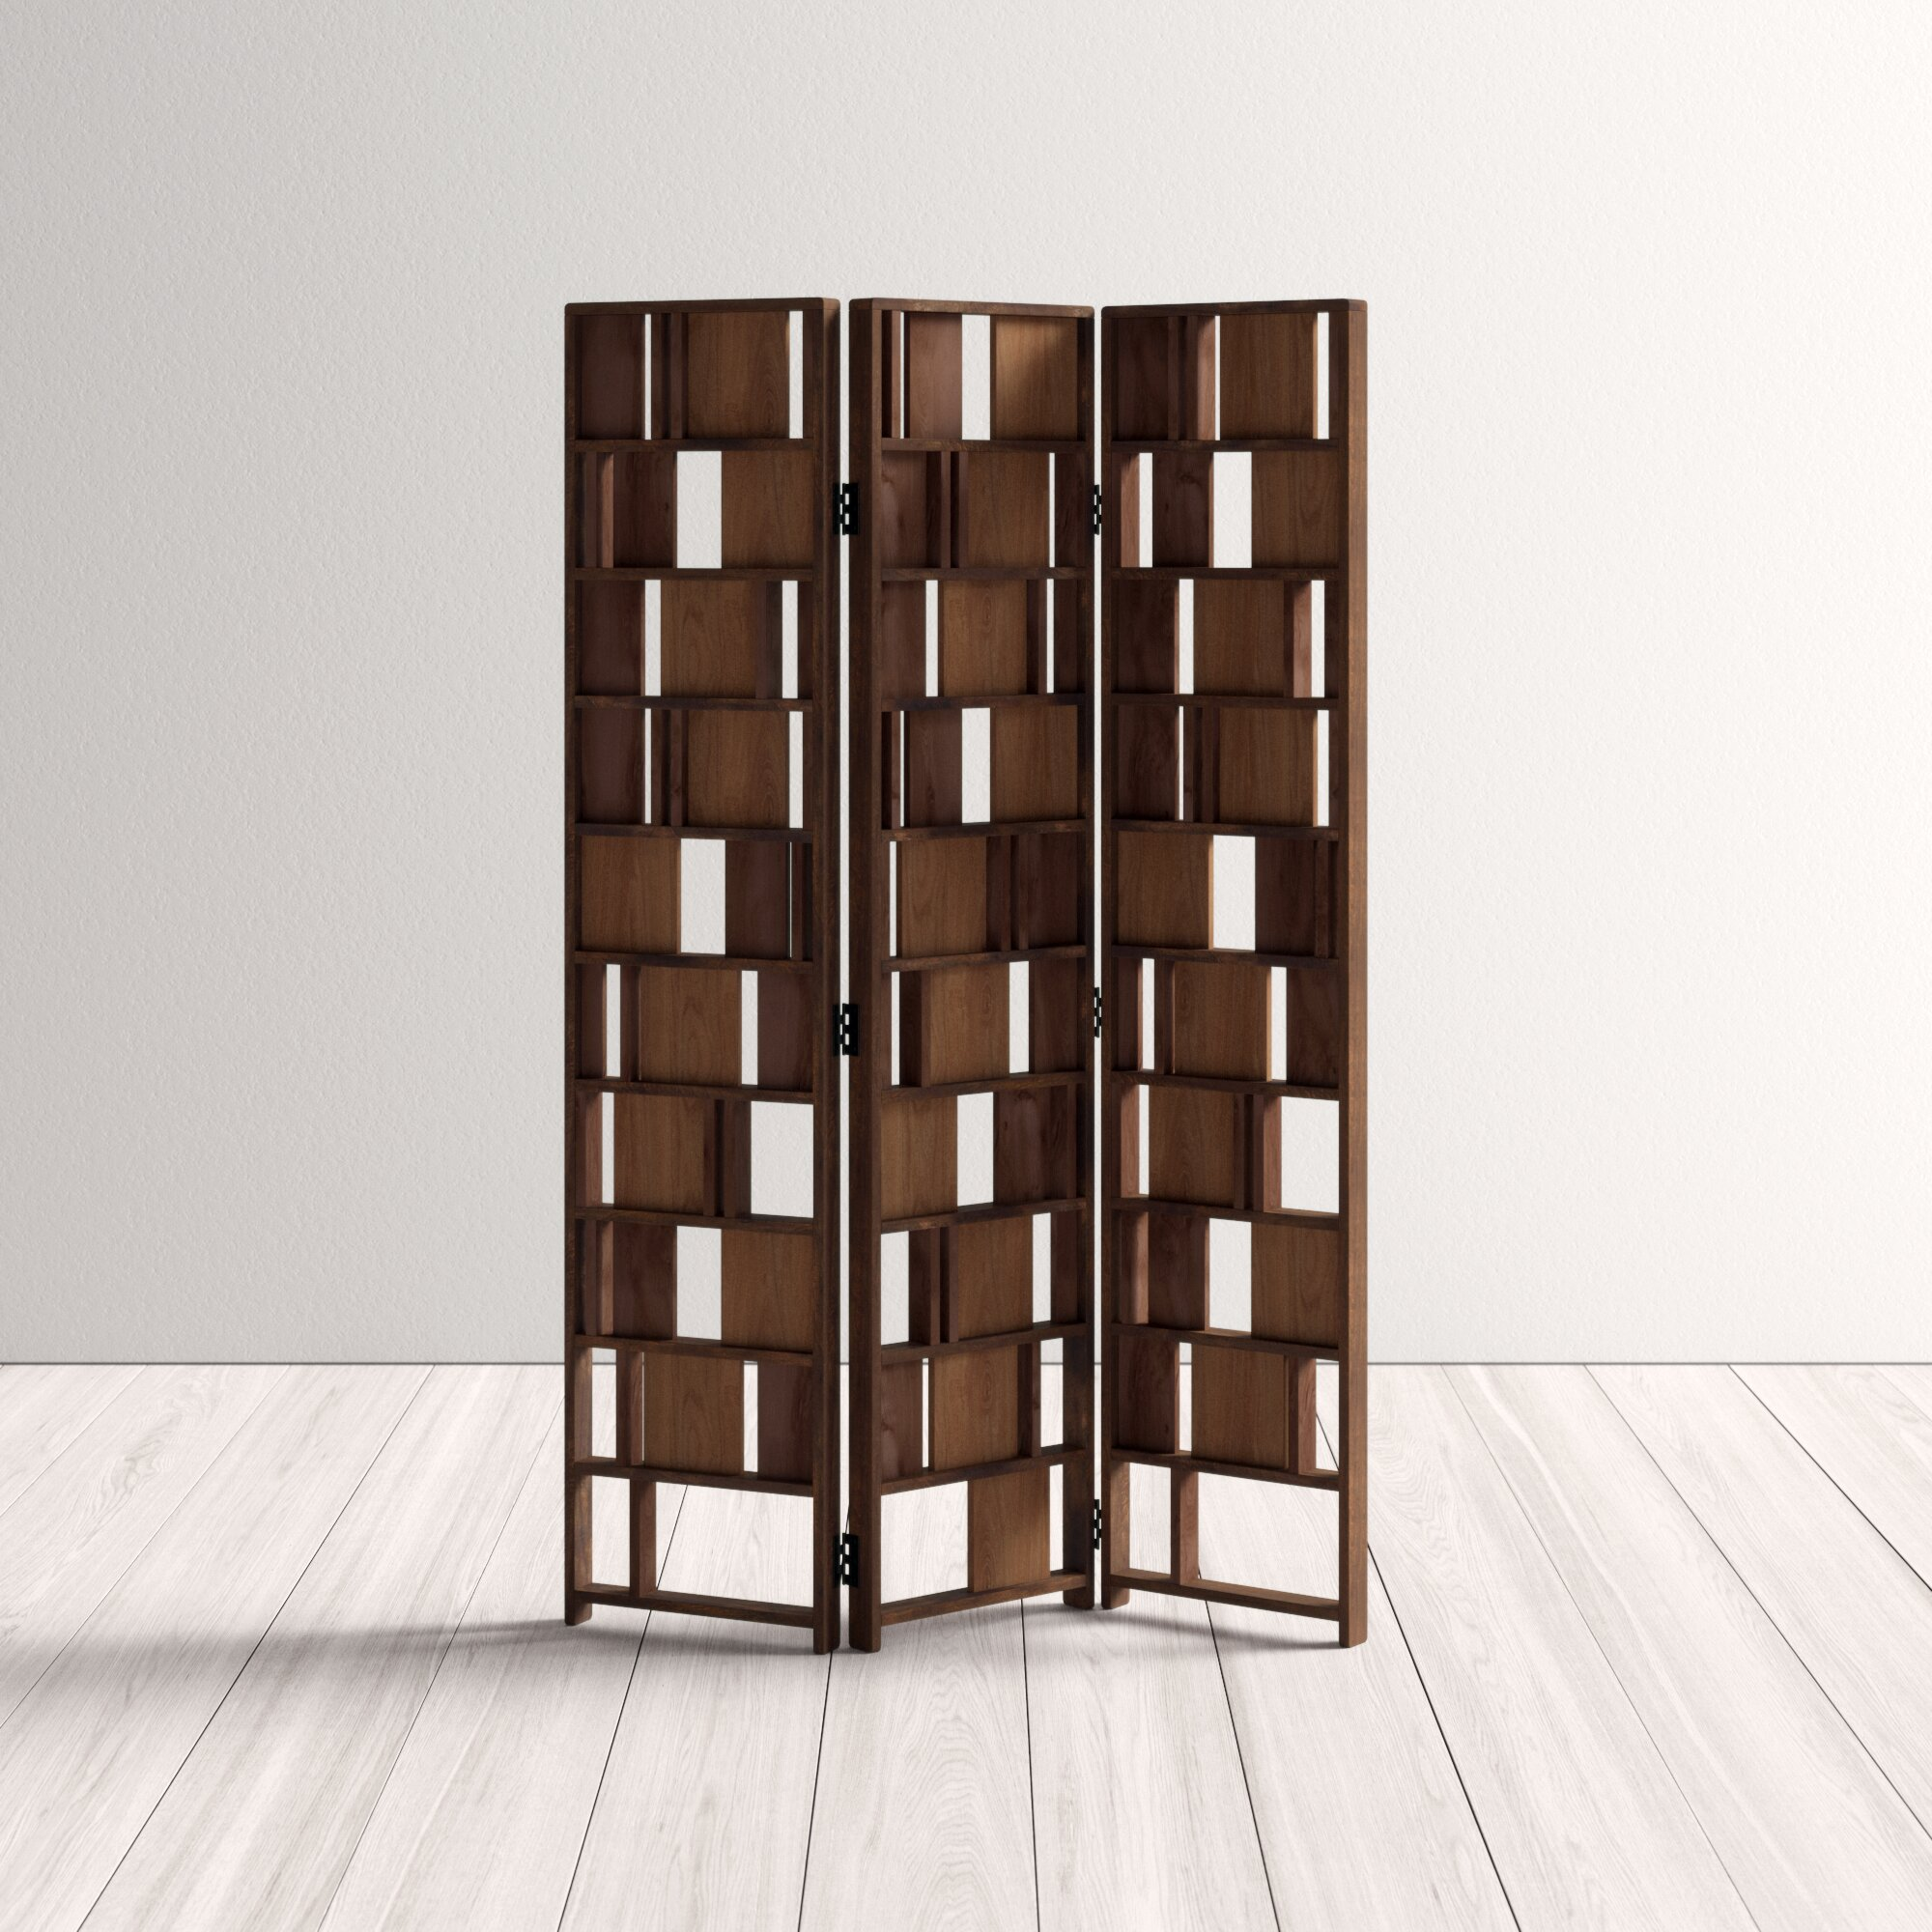 Ansel 3 Panel Room Divider Reviews Allmodern